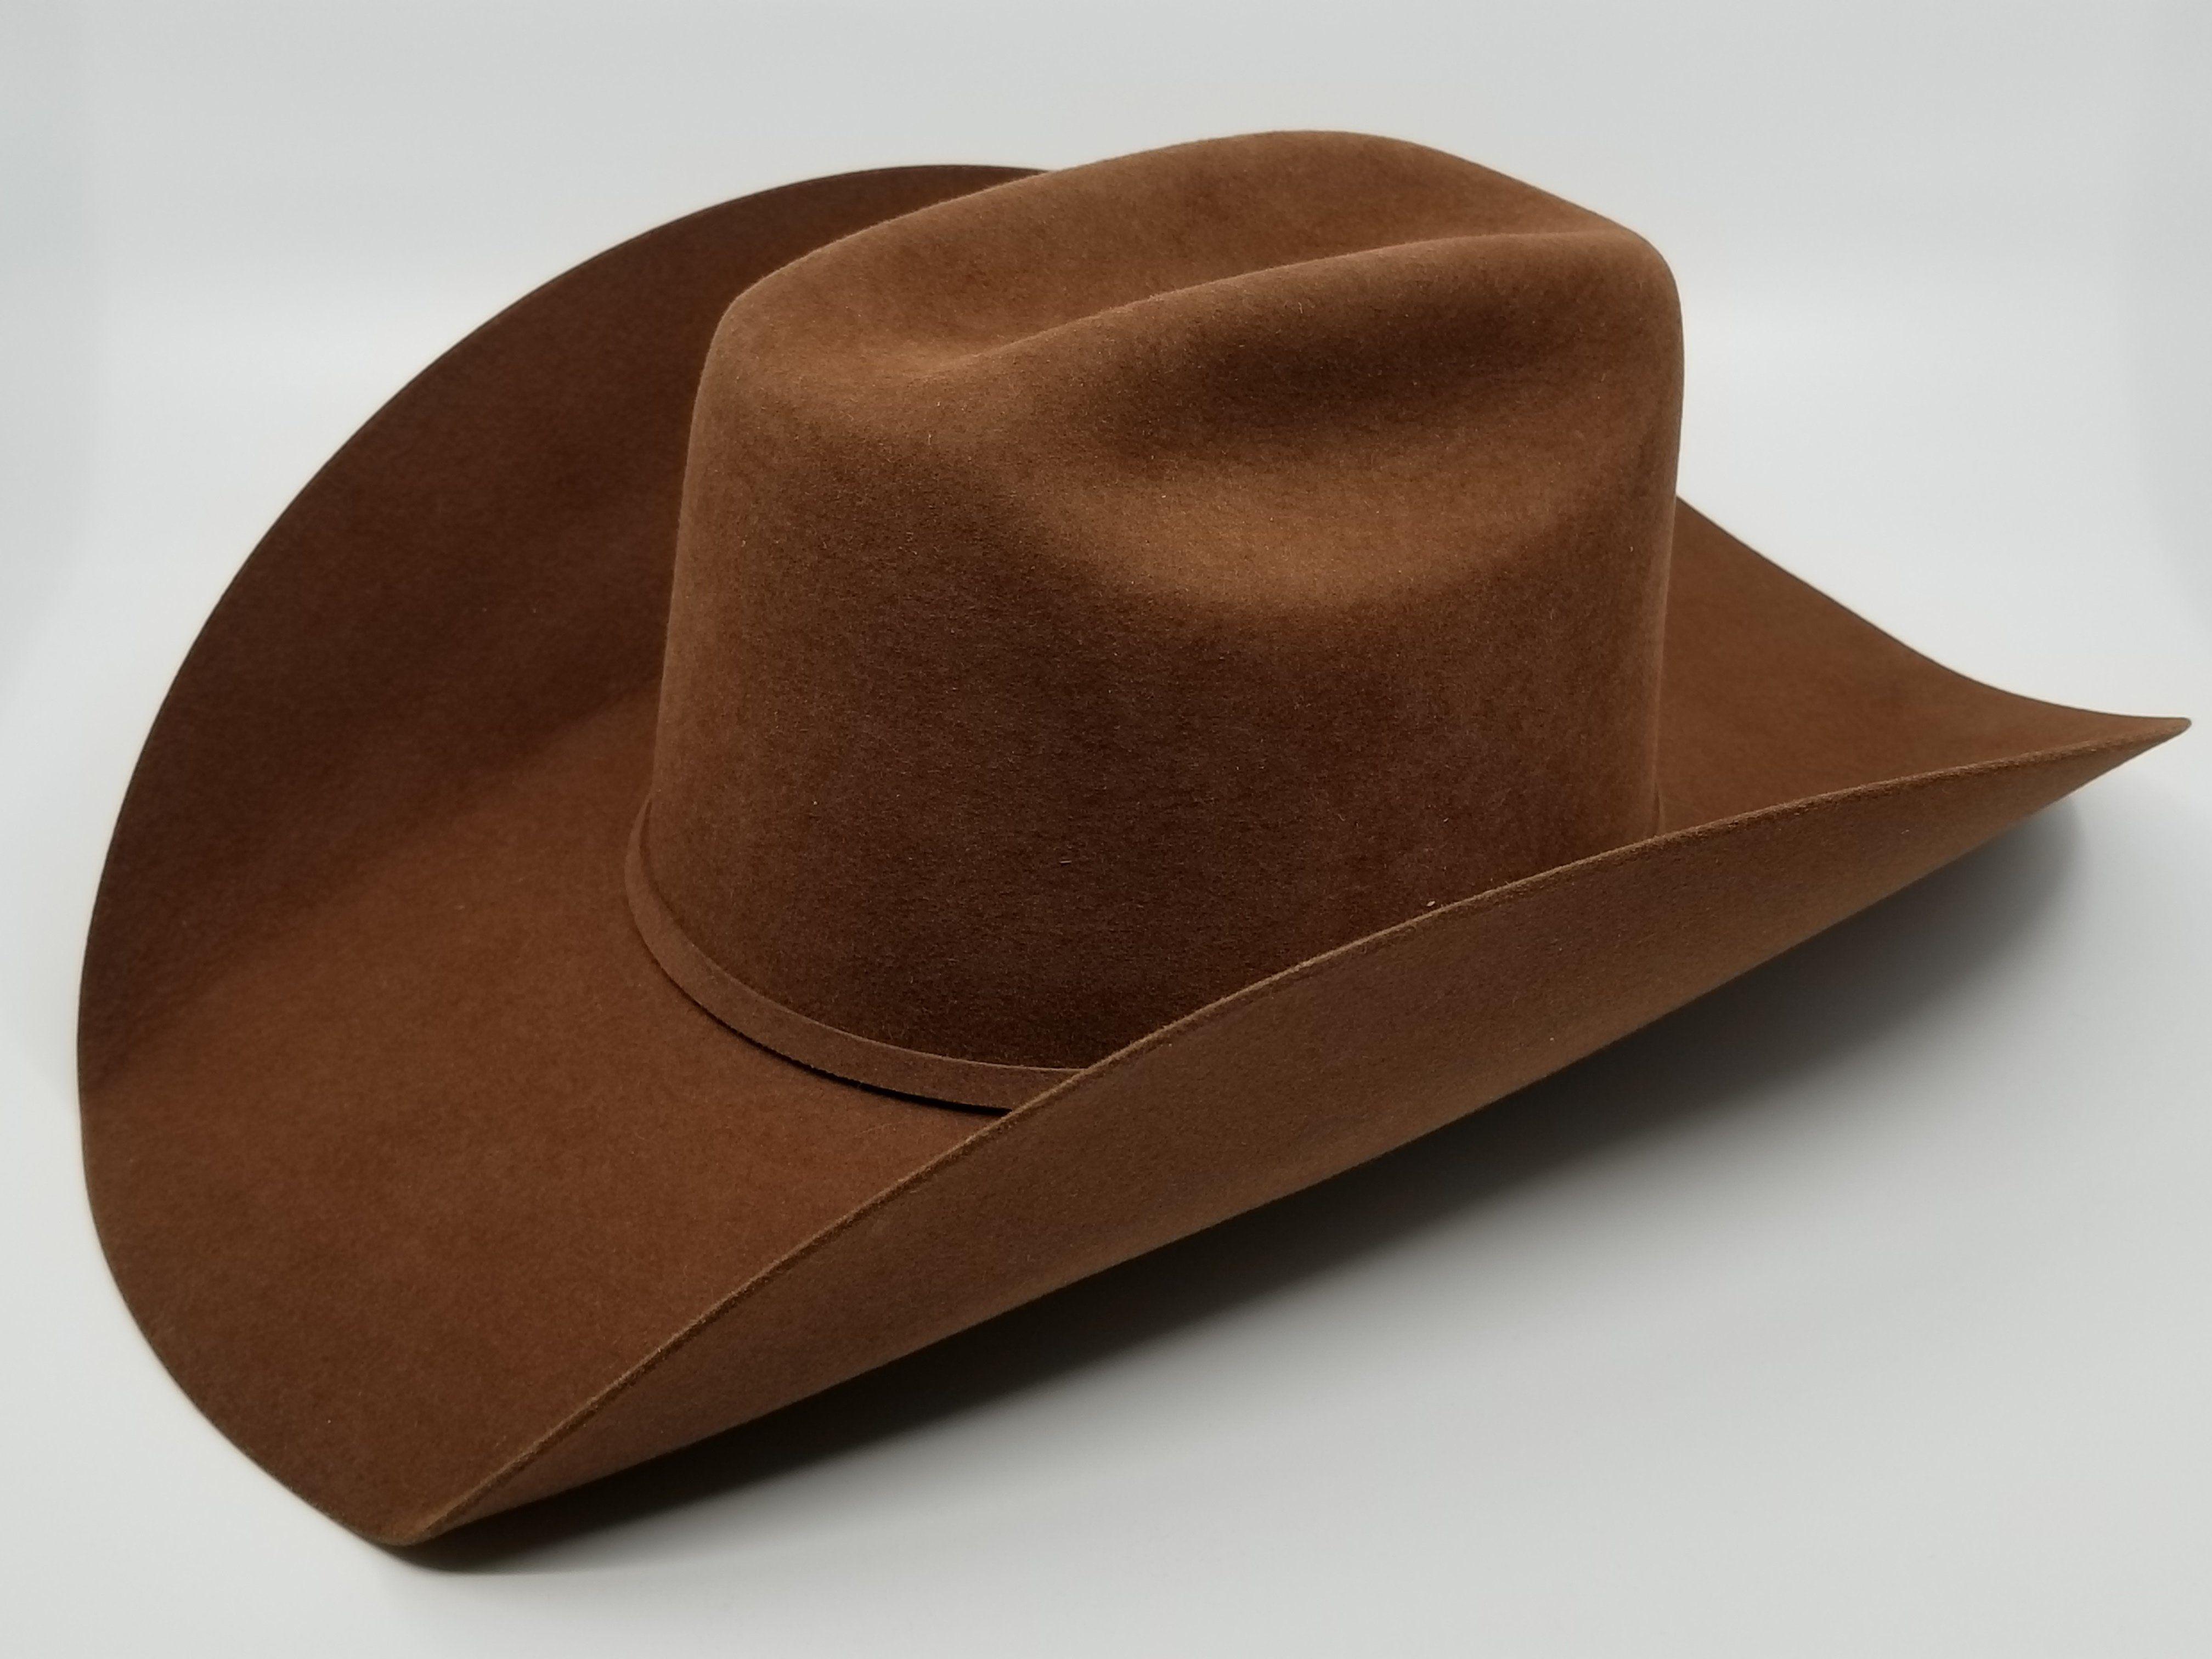 Atwood Felt Winchester Rust Felt Cowboy Hats Cowboy Hats Rodeo King Hats